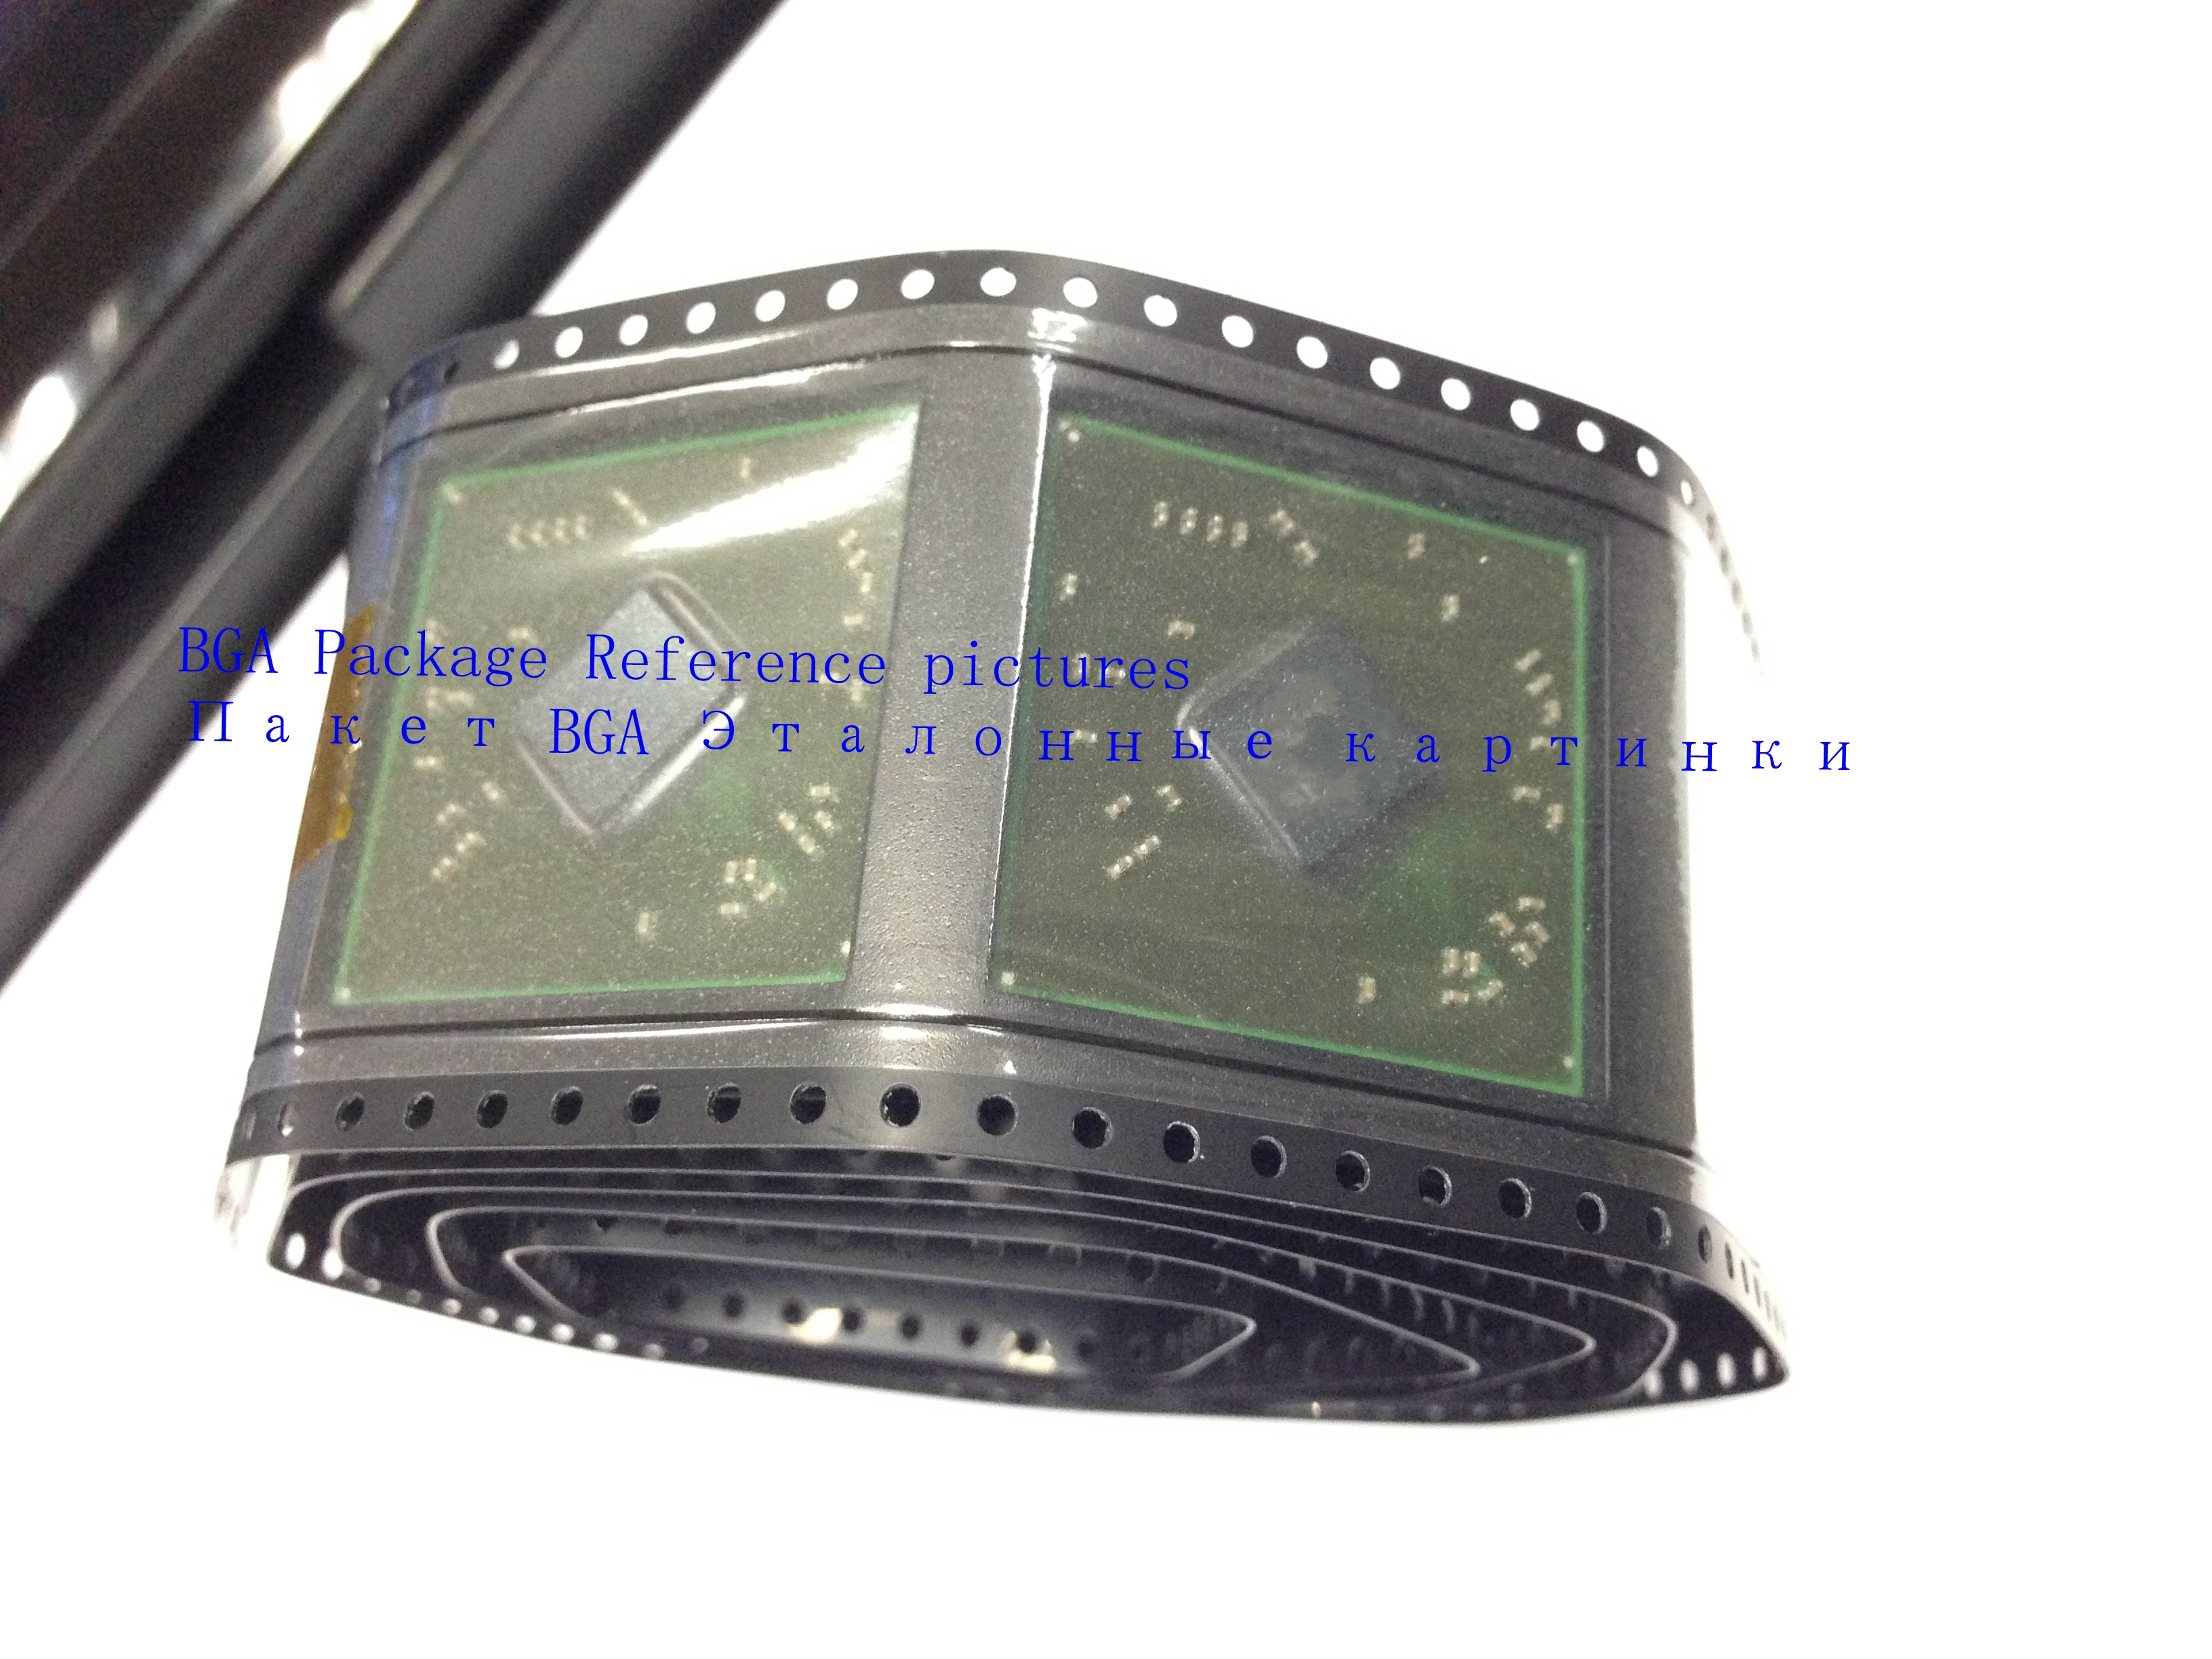 1pcs/lot 100% New GF-GO7400-N-A3 GF-G07400-N-A3 GF GO7400 N A3 GF G07400 N A3 BGA Chipset1pcs/lot 100% New GF-GO7400-N-A3 GF-G07400-N-A3 GF GO7400 N A3 GF G07400 N A3 BGA Chipset